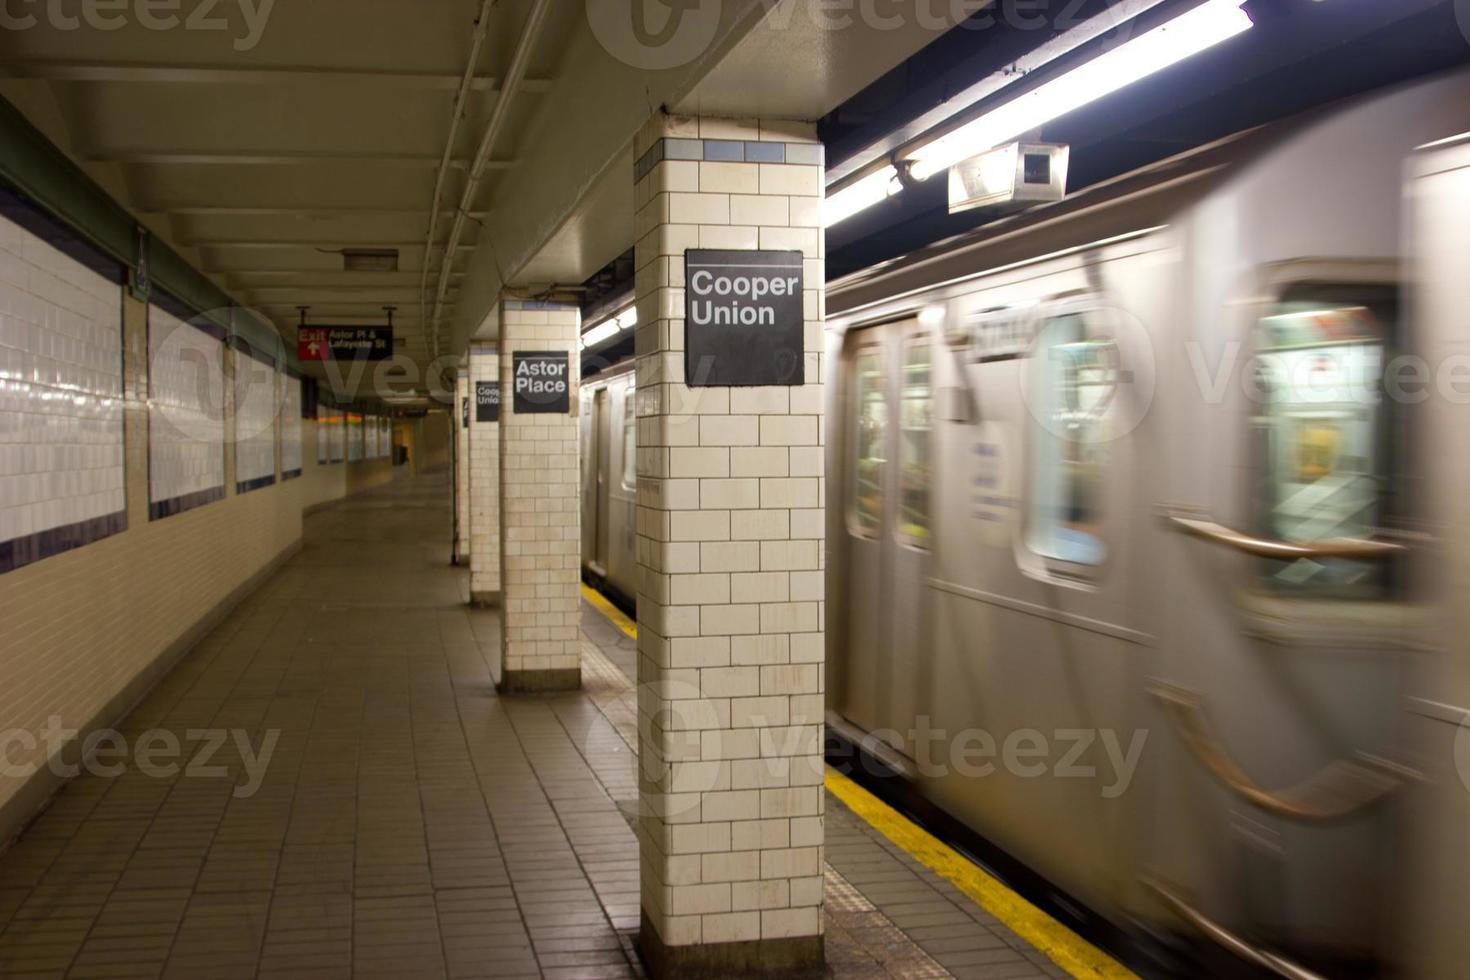 Cooper Union en Astor Place metrostation, NYC foto